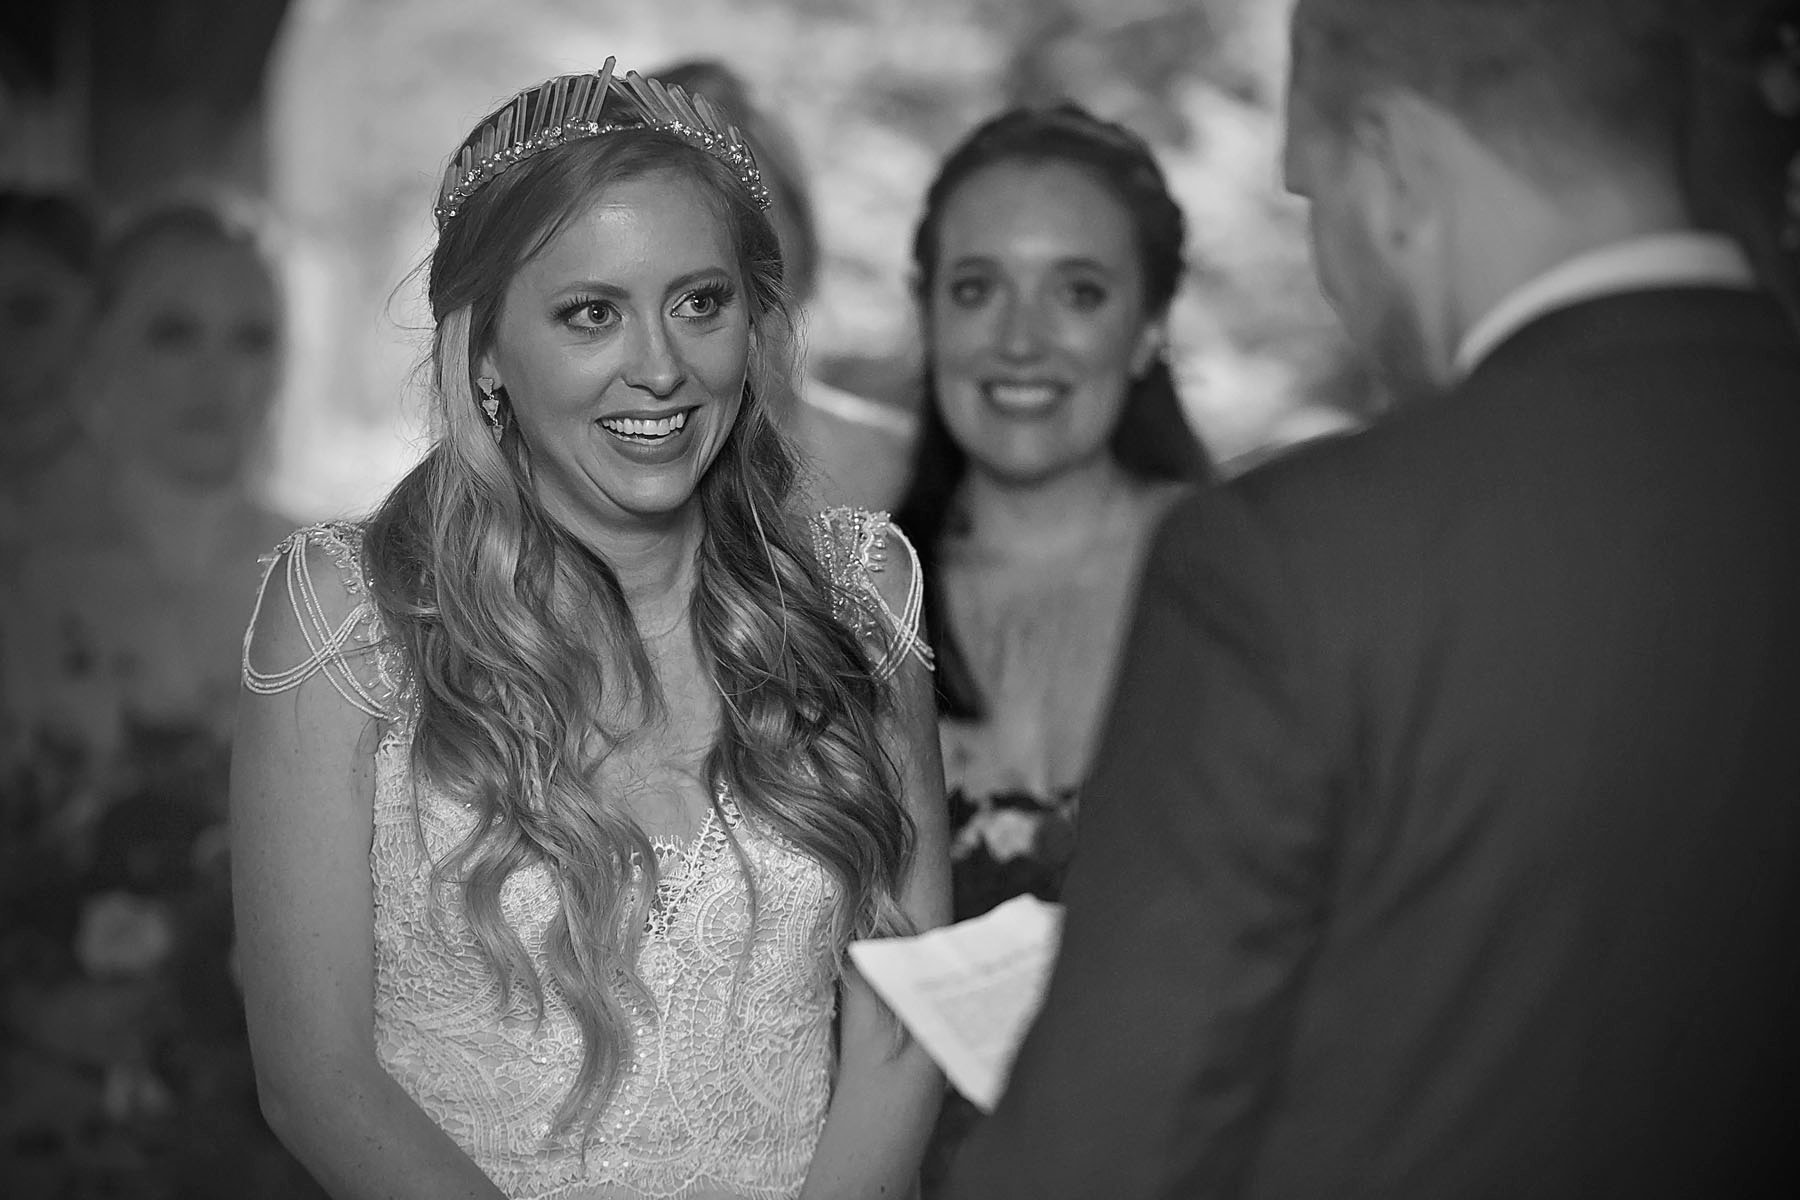 Bucks_County_wedding_photographer_Stroudsmoor_country_inn_wedding_Philadelphia_wedding_photographer_17_bride_laughs_at_grooms_vows.JPG